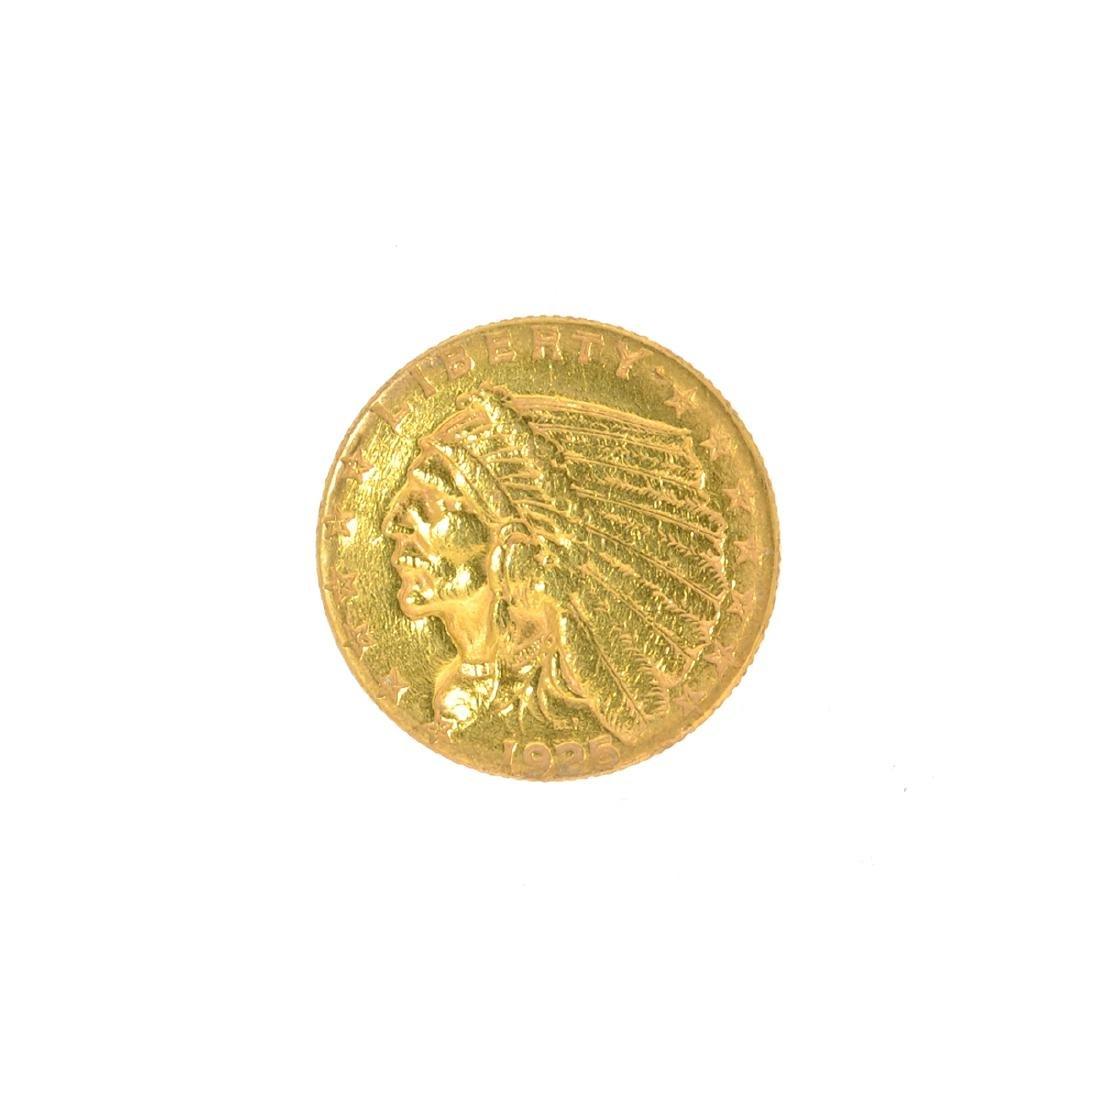 *1925-D $2.50 U.S. Indian Head Gold Coin (JG N)